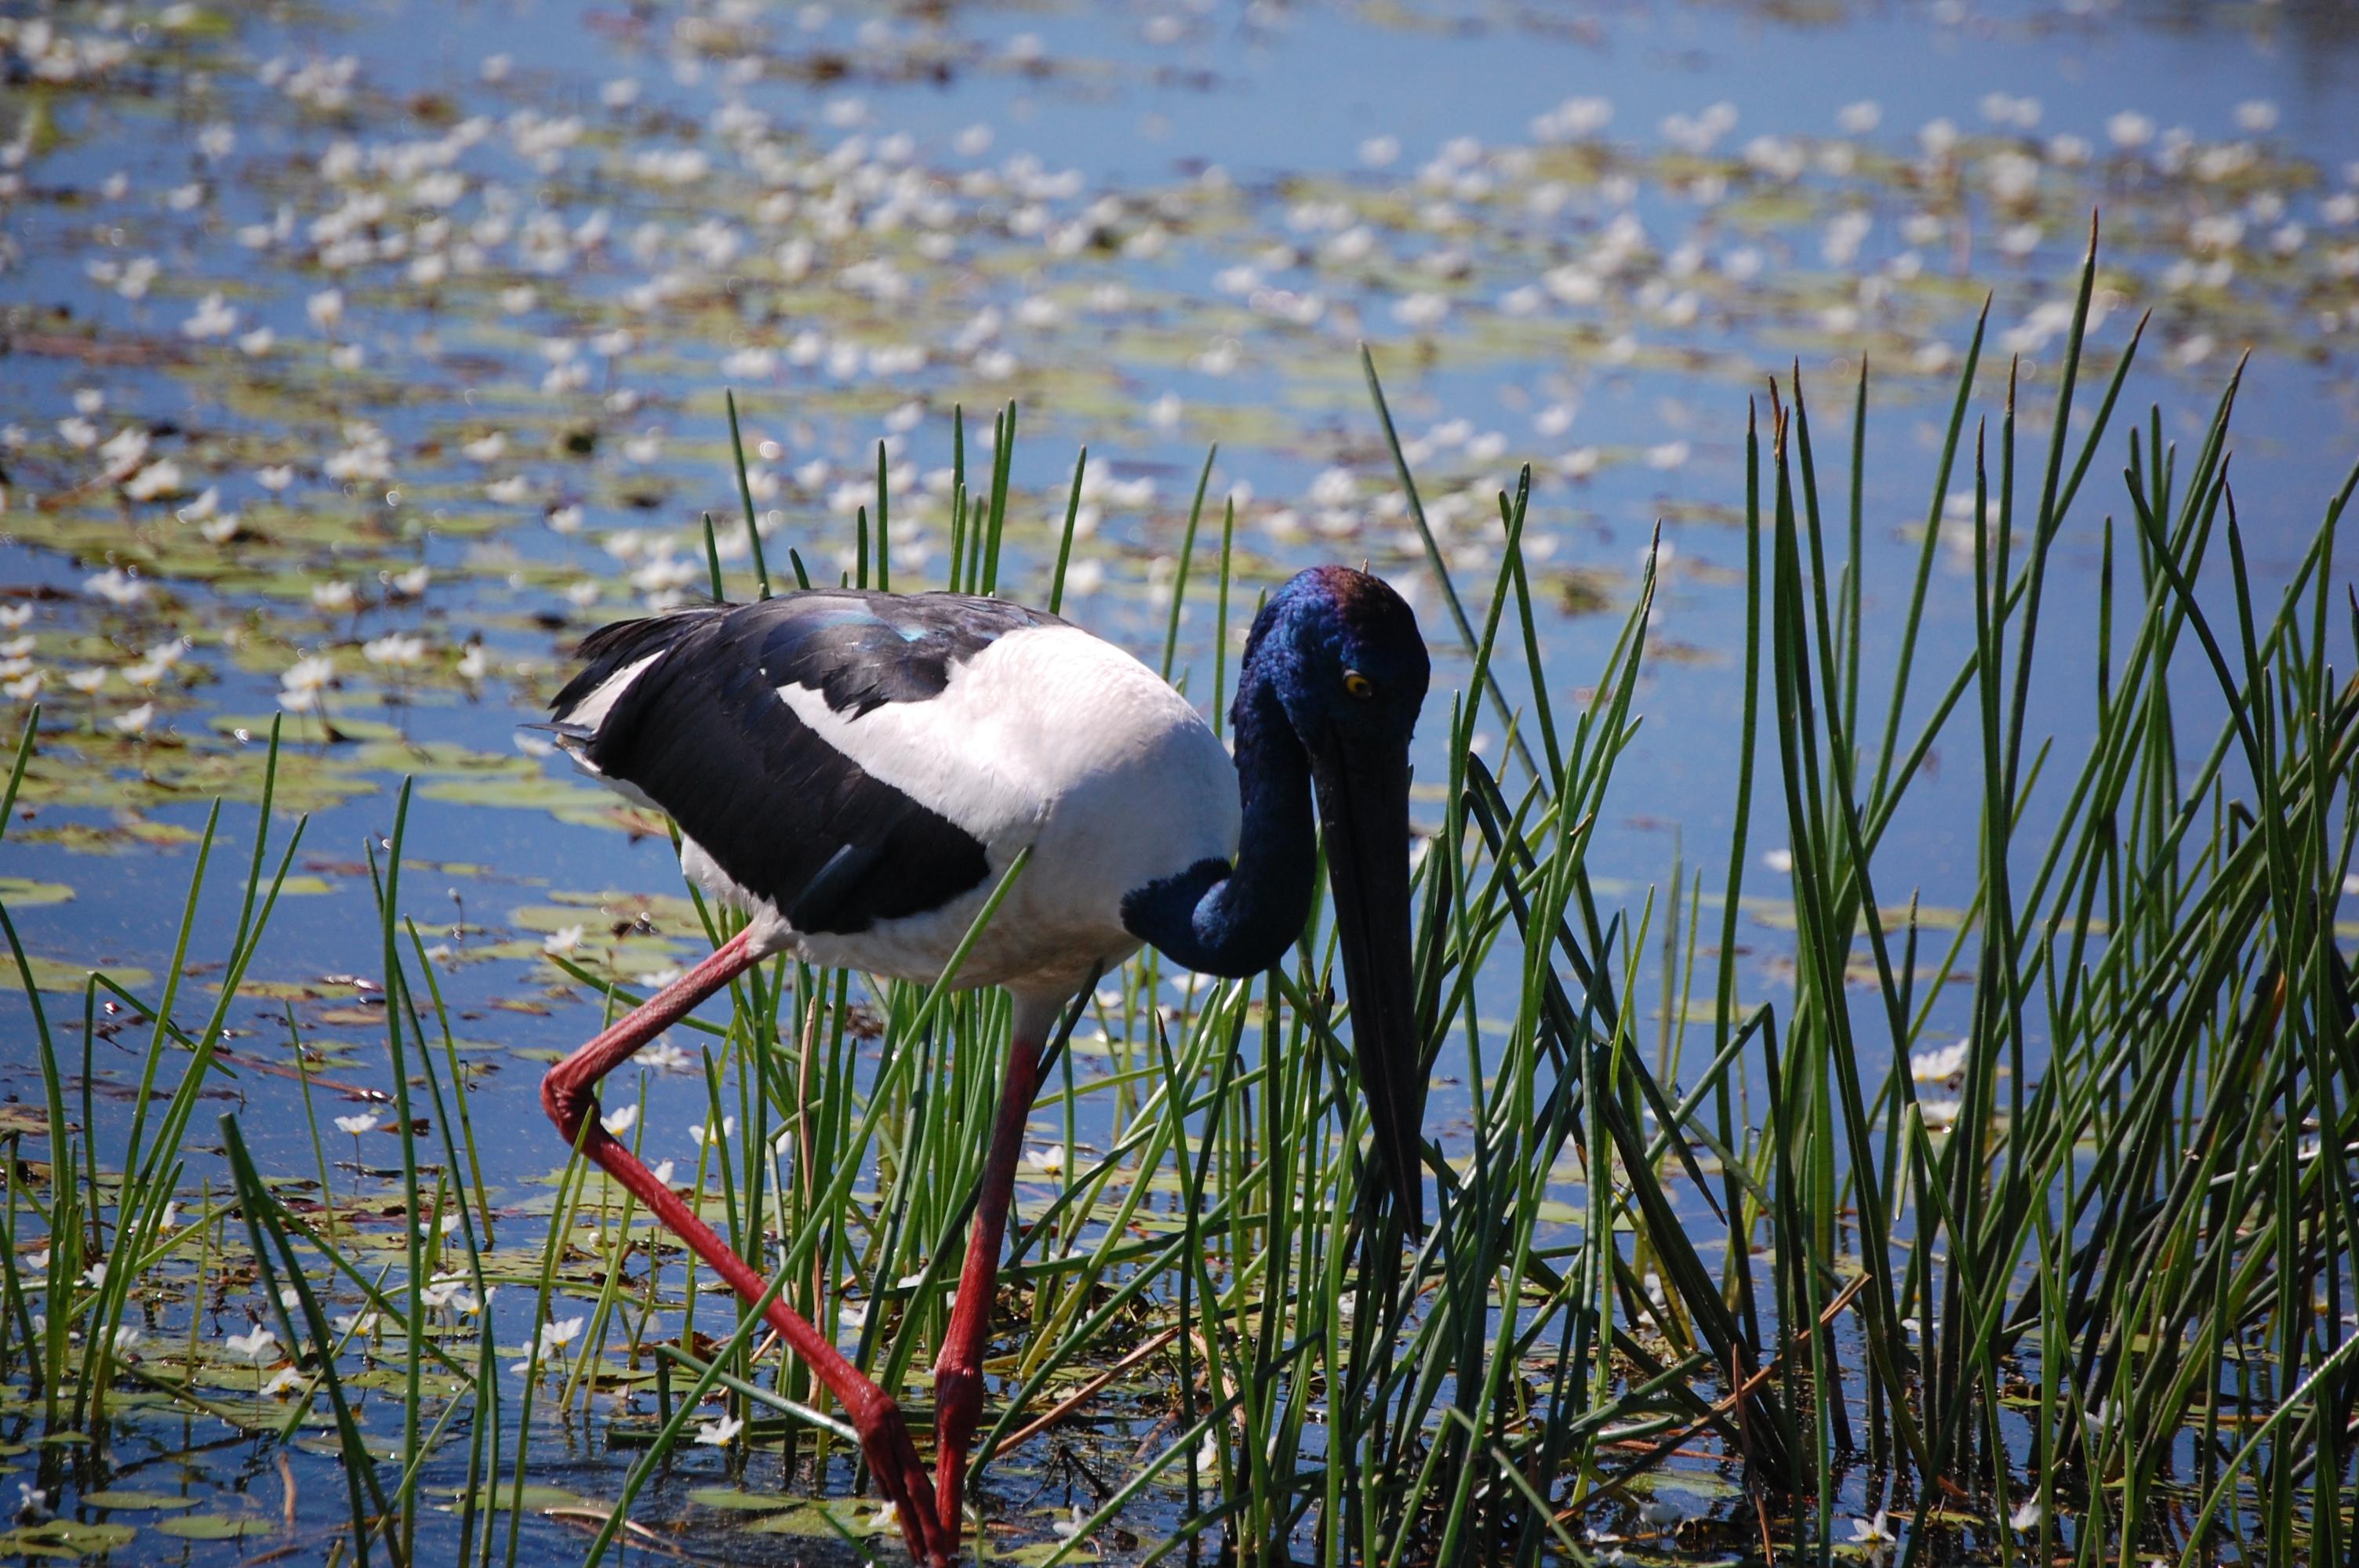 One of Kadaku's birds